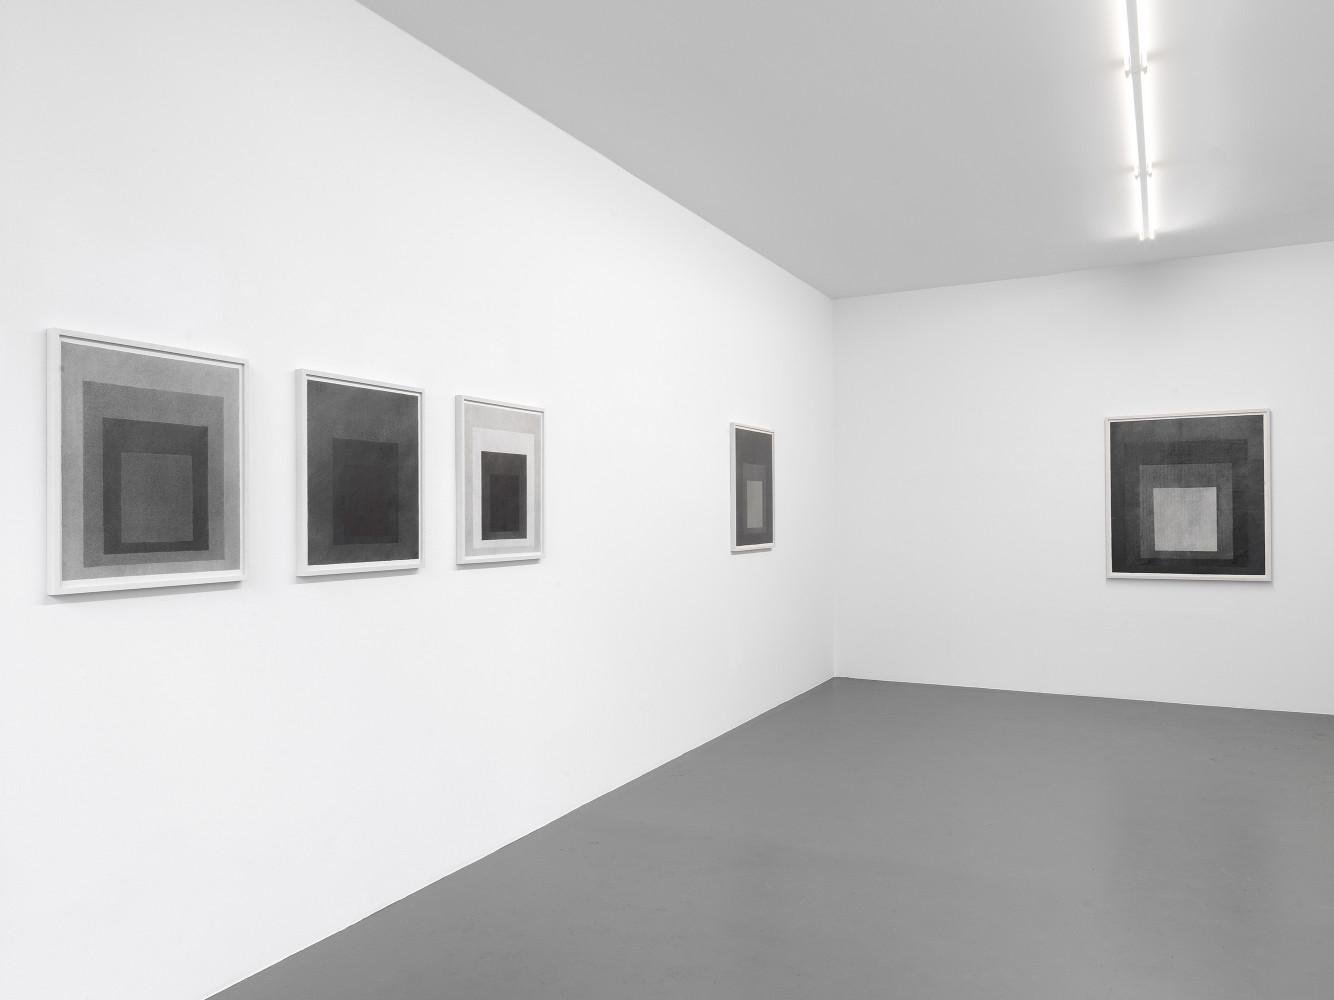 Klaus Mosettig, Installation view, Buchmann Box, 2013